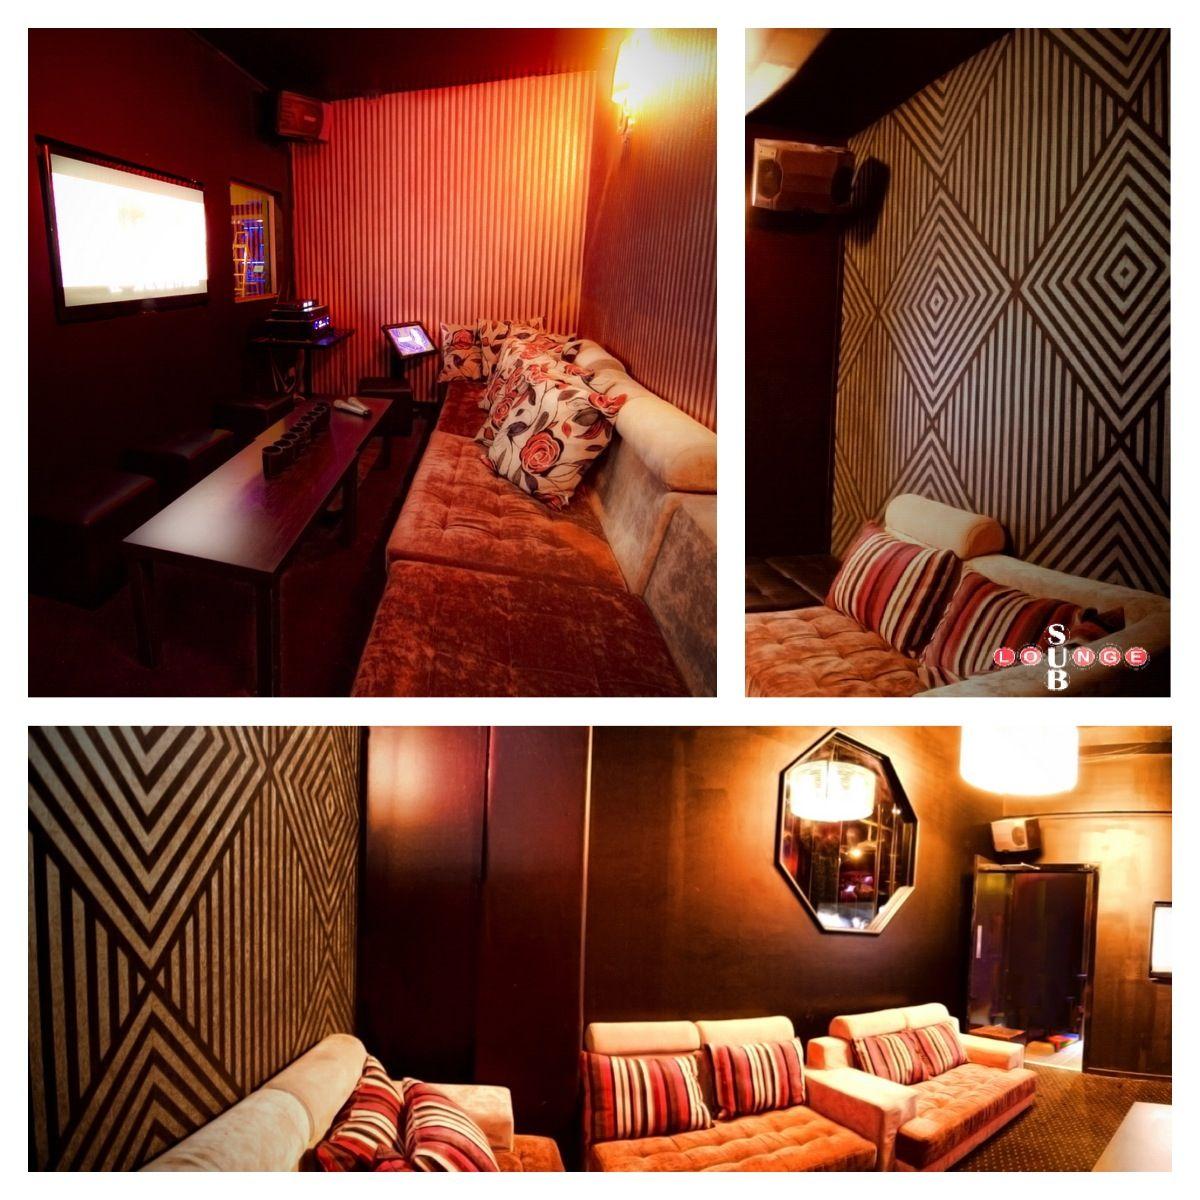 Semicircular Ktv Room Interior Design: Karaoke Rooms, Another New Private Room